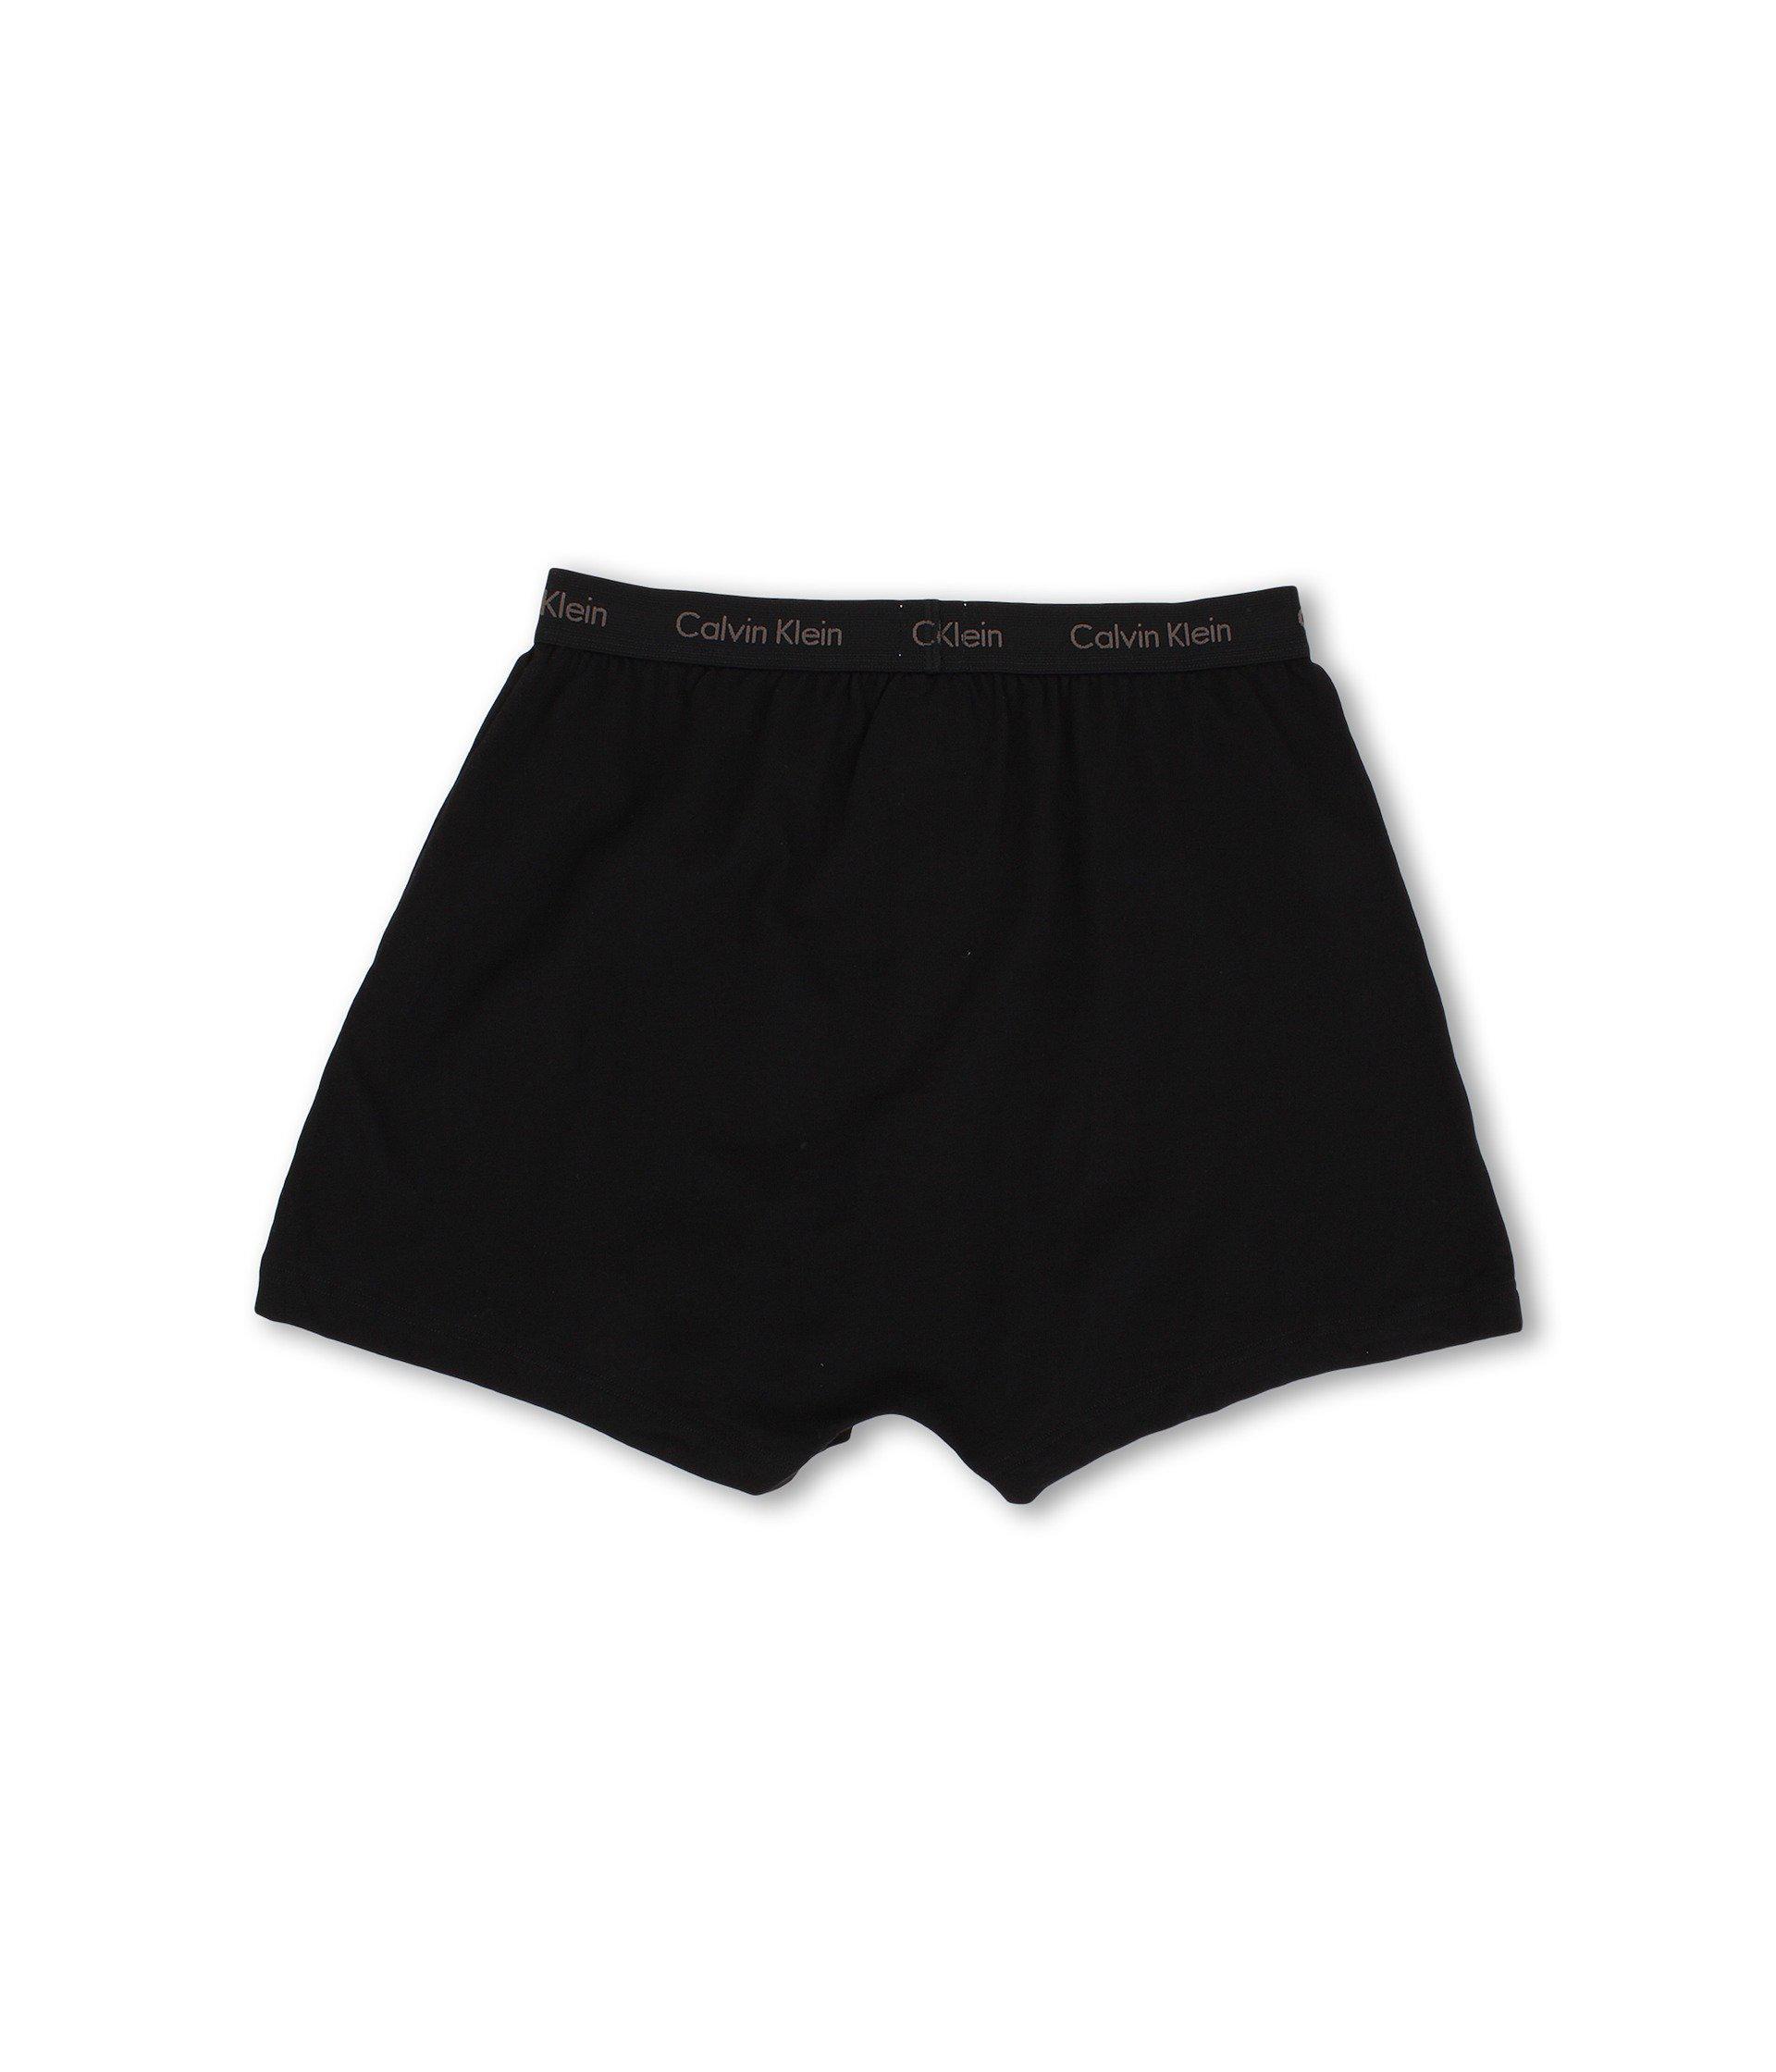 7dcca7387eb8 Calvin Klein - Cotton Classic Knit Boxer 3-pack Nu3040 (black) Men's  Underwear. View fullscreen